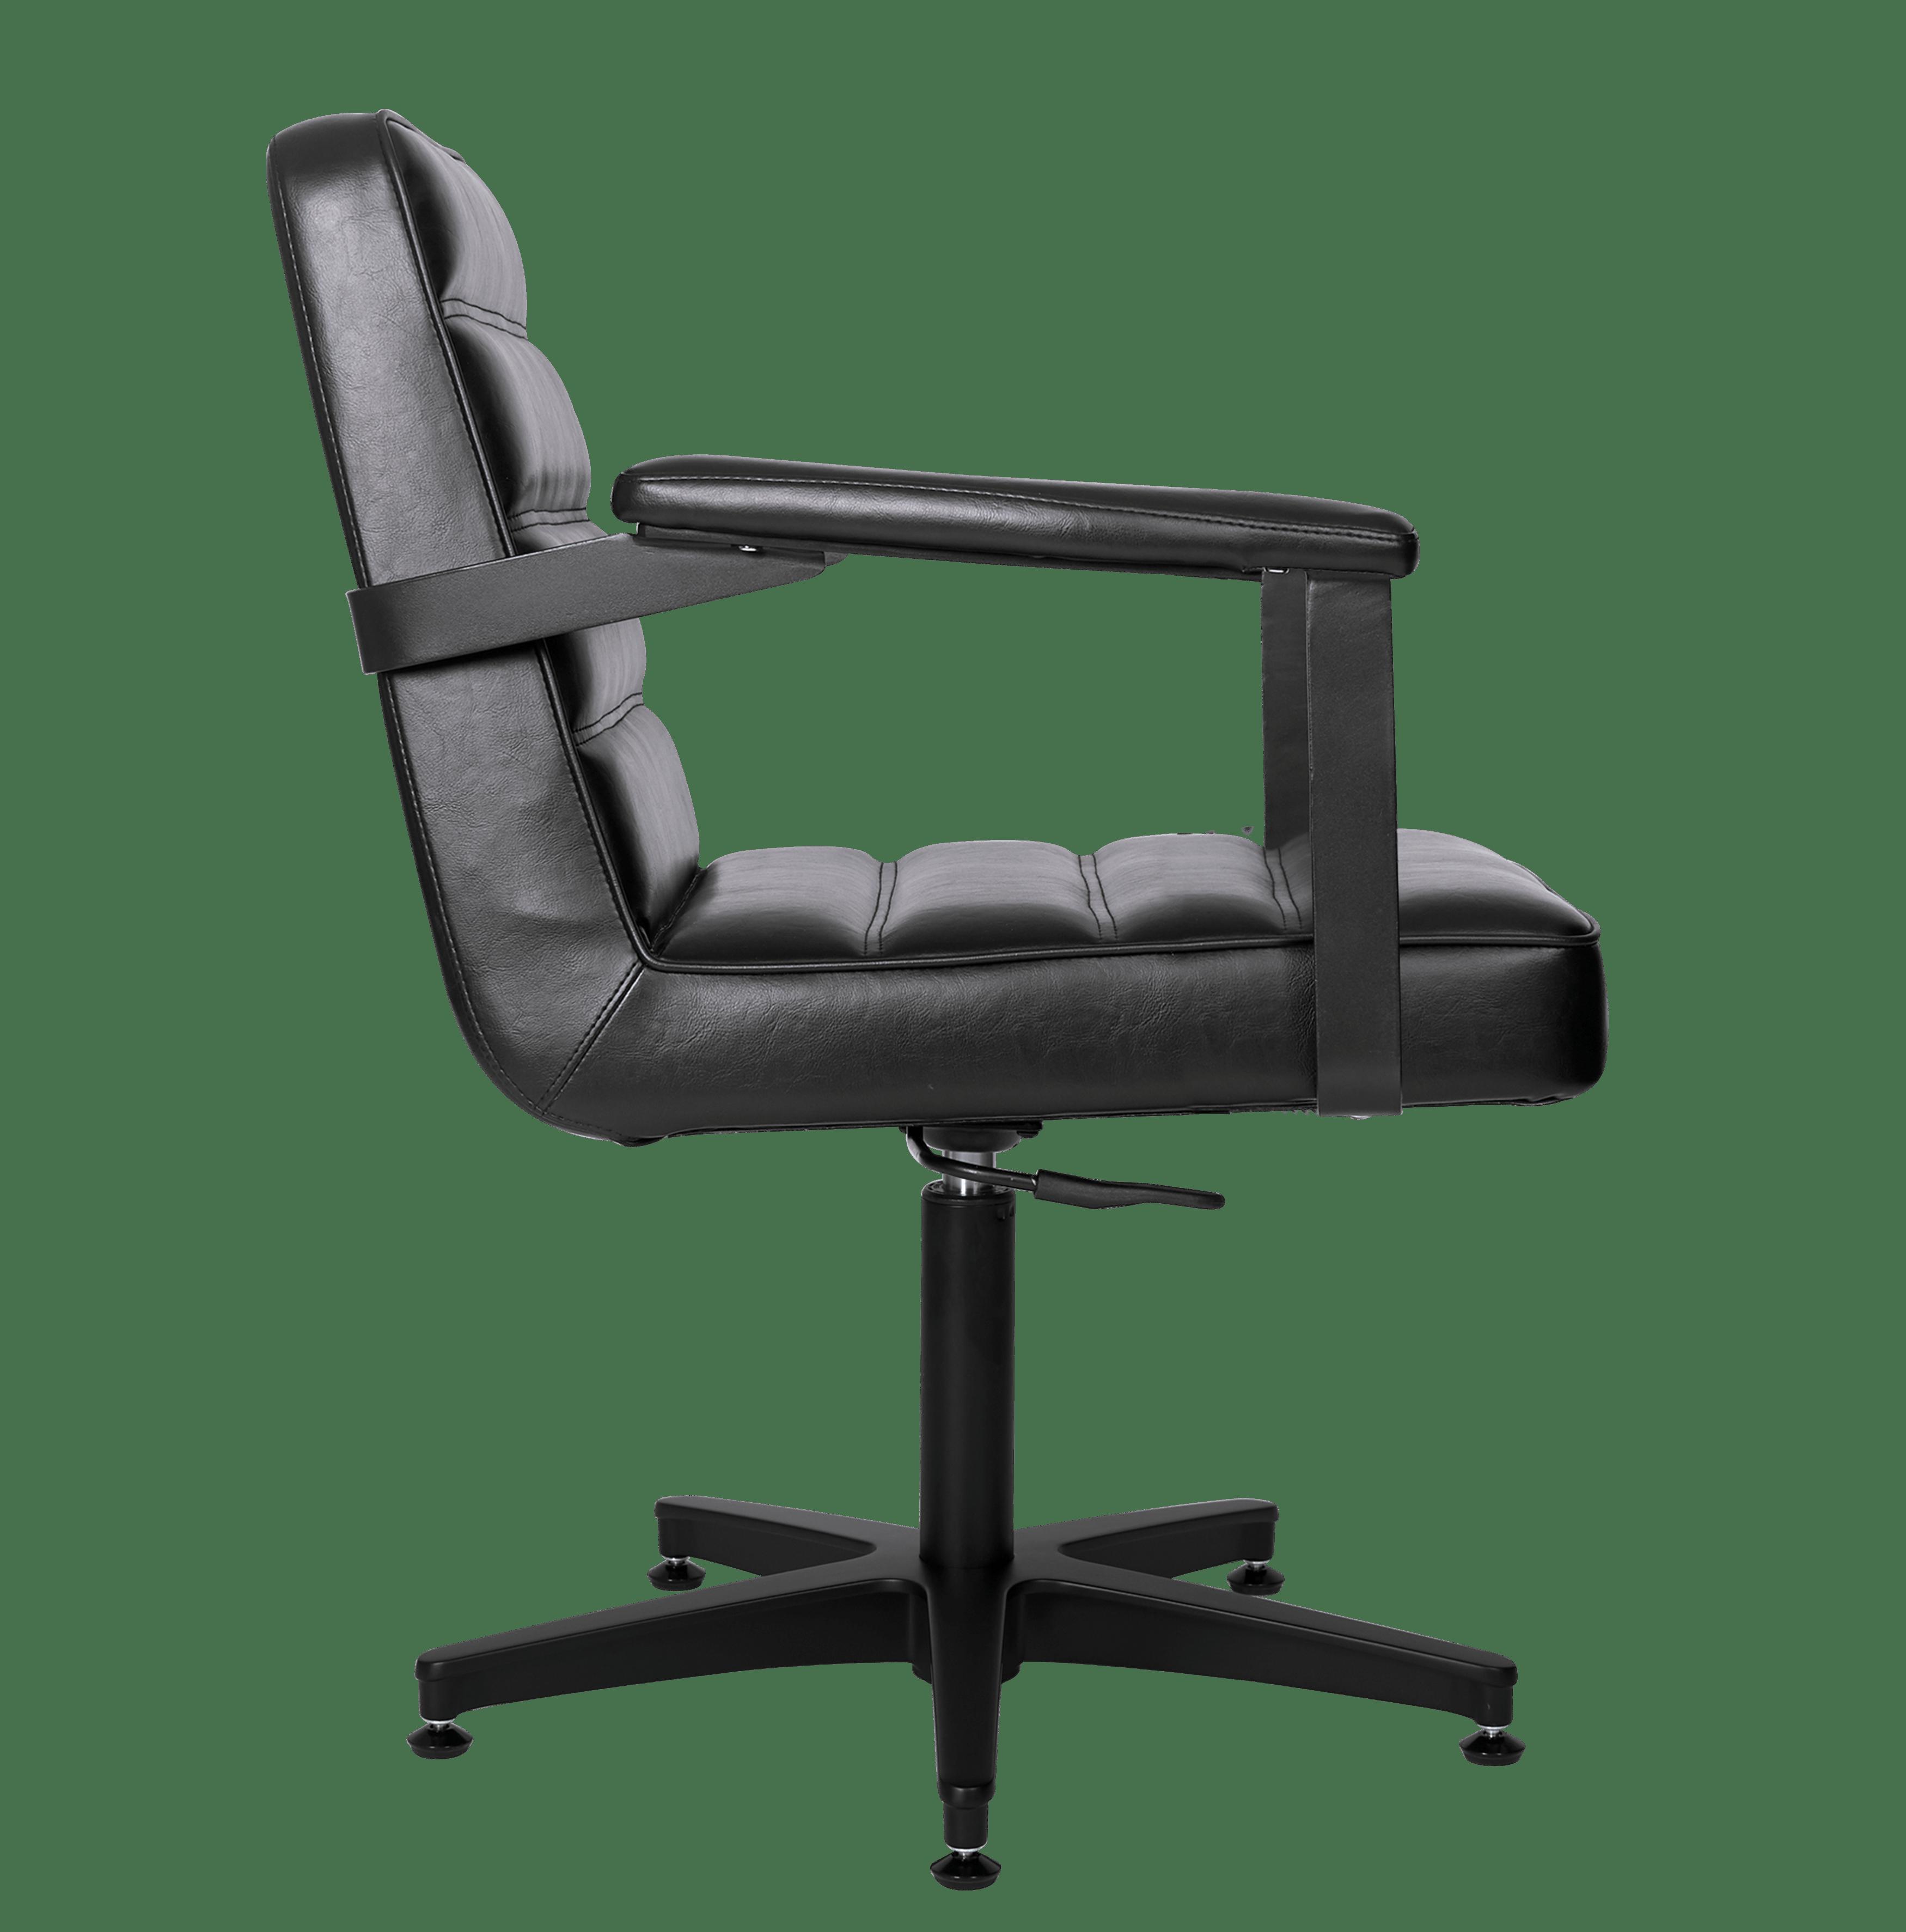 4152-Franka Styling Chair Side